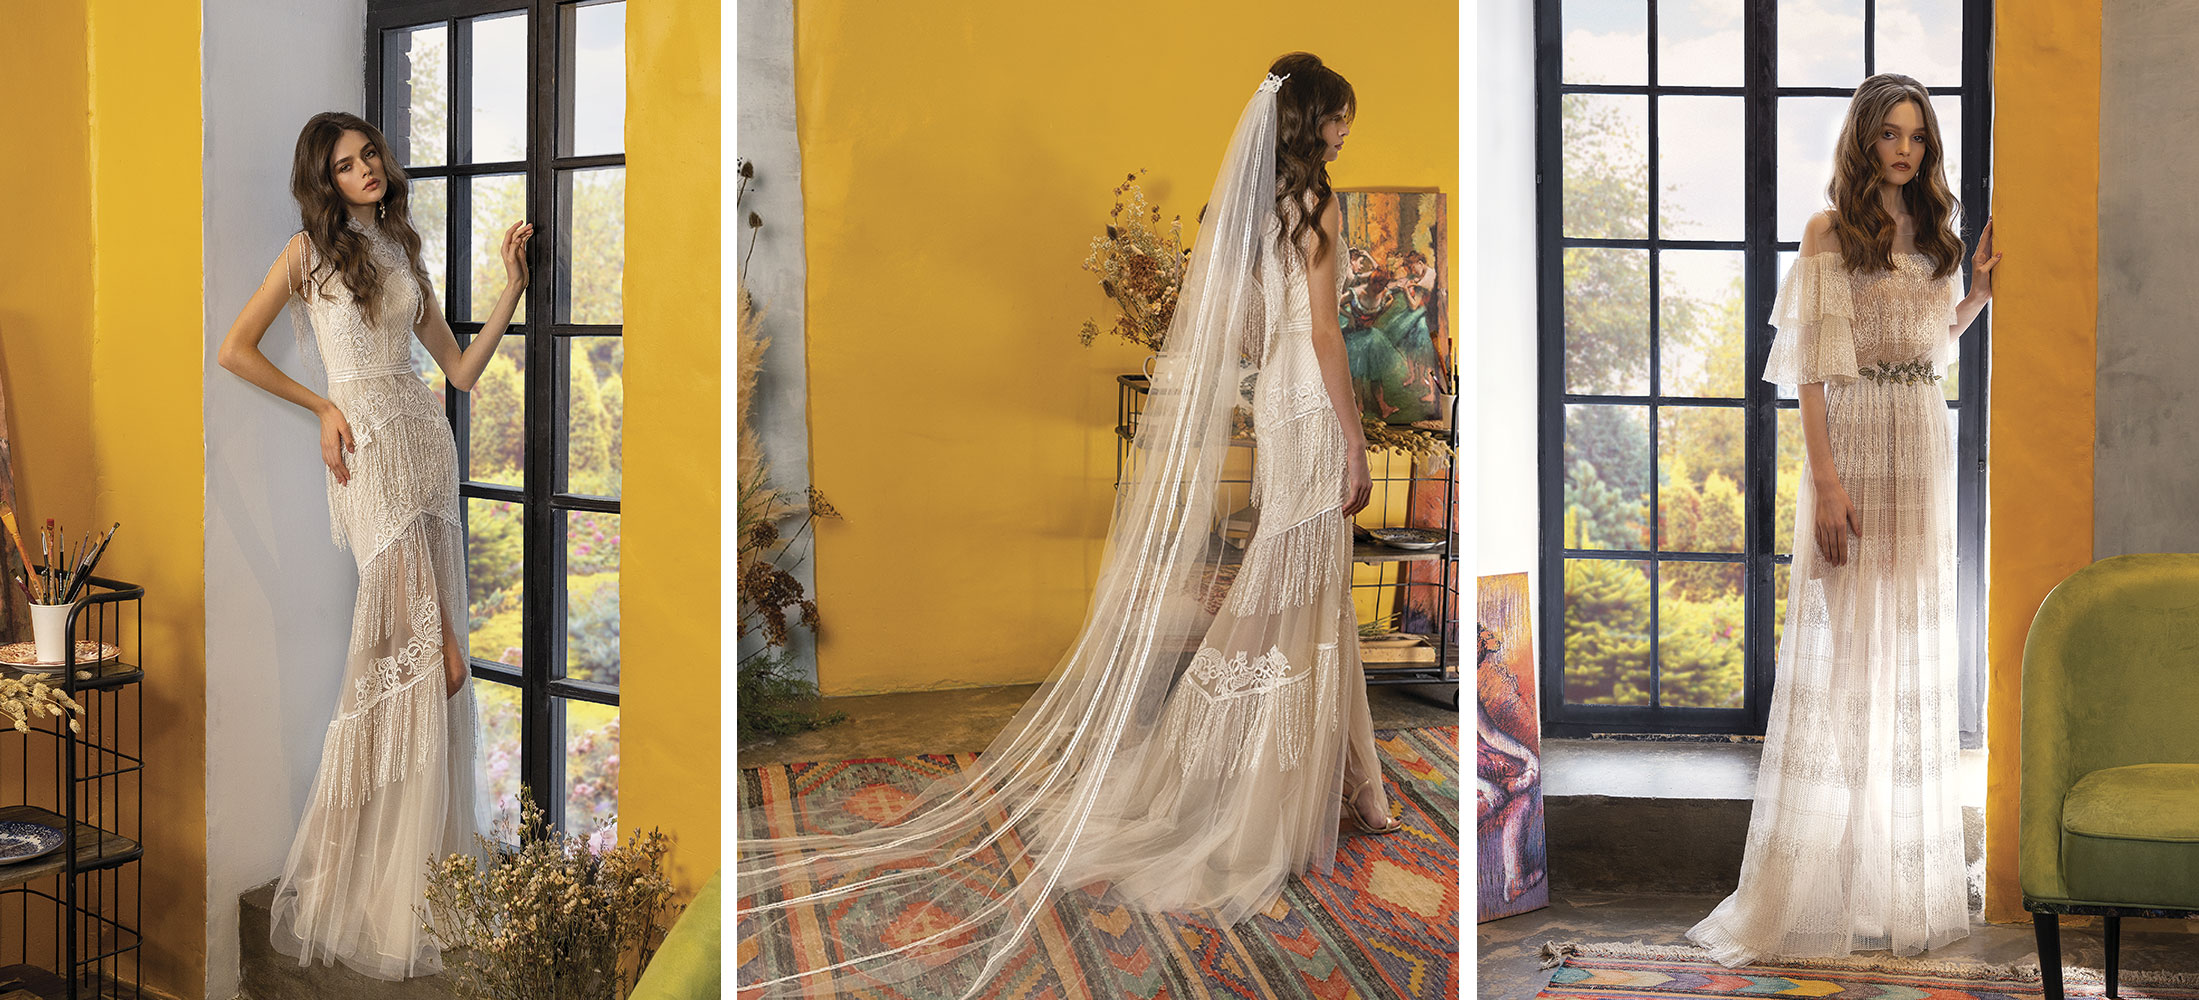 Wedding Dress Shopping Guide - Papilio Boutique